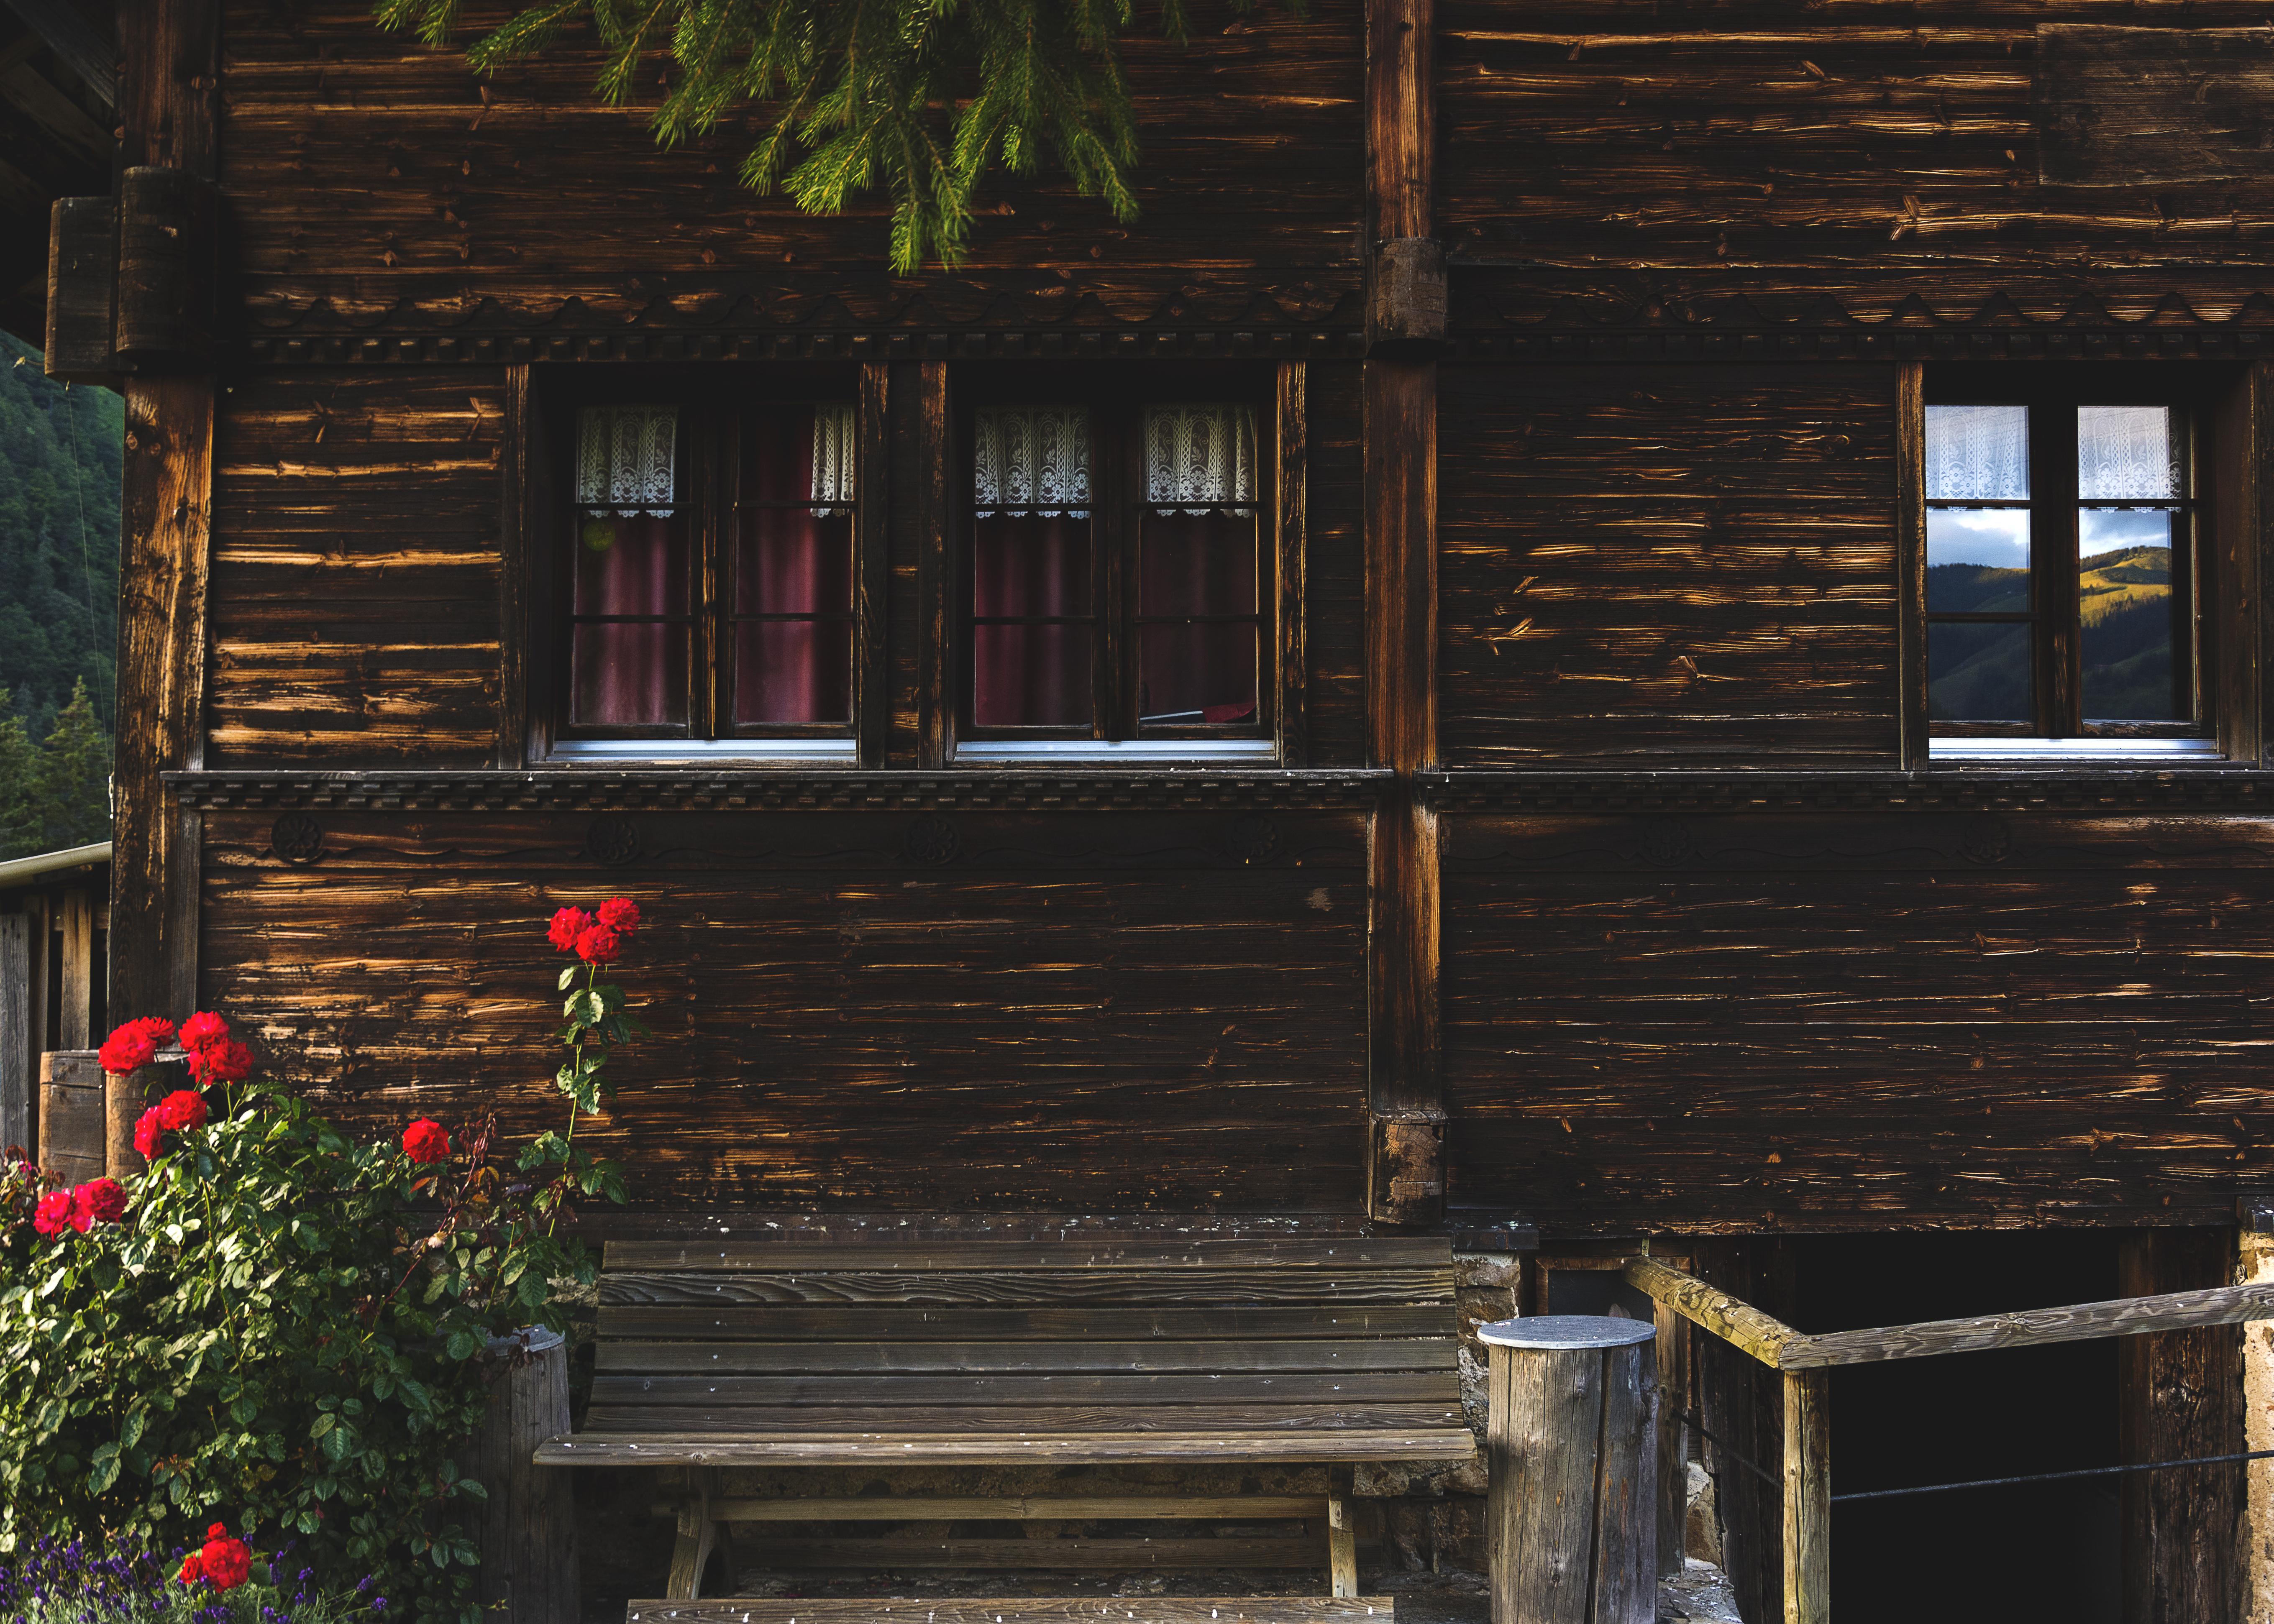 wooden photo bavarian window image alpine idyllic of cottage curtains royalty summer free panels stock